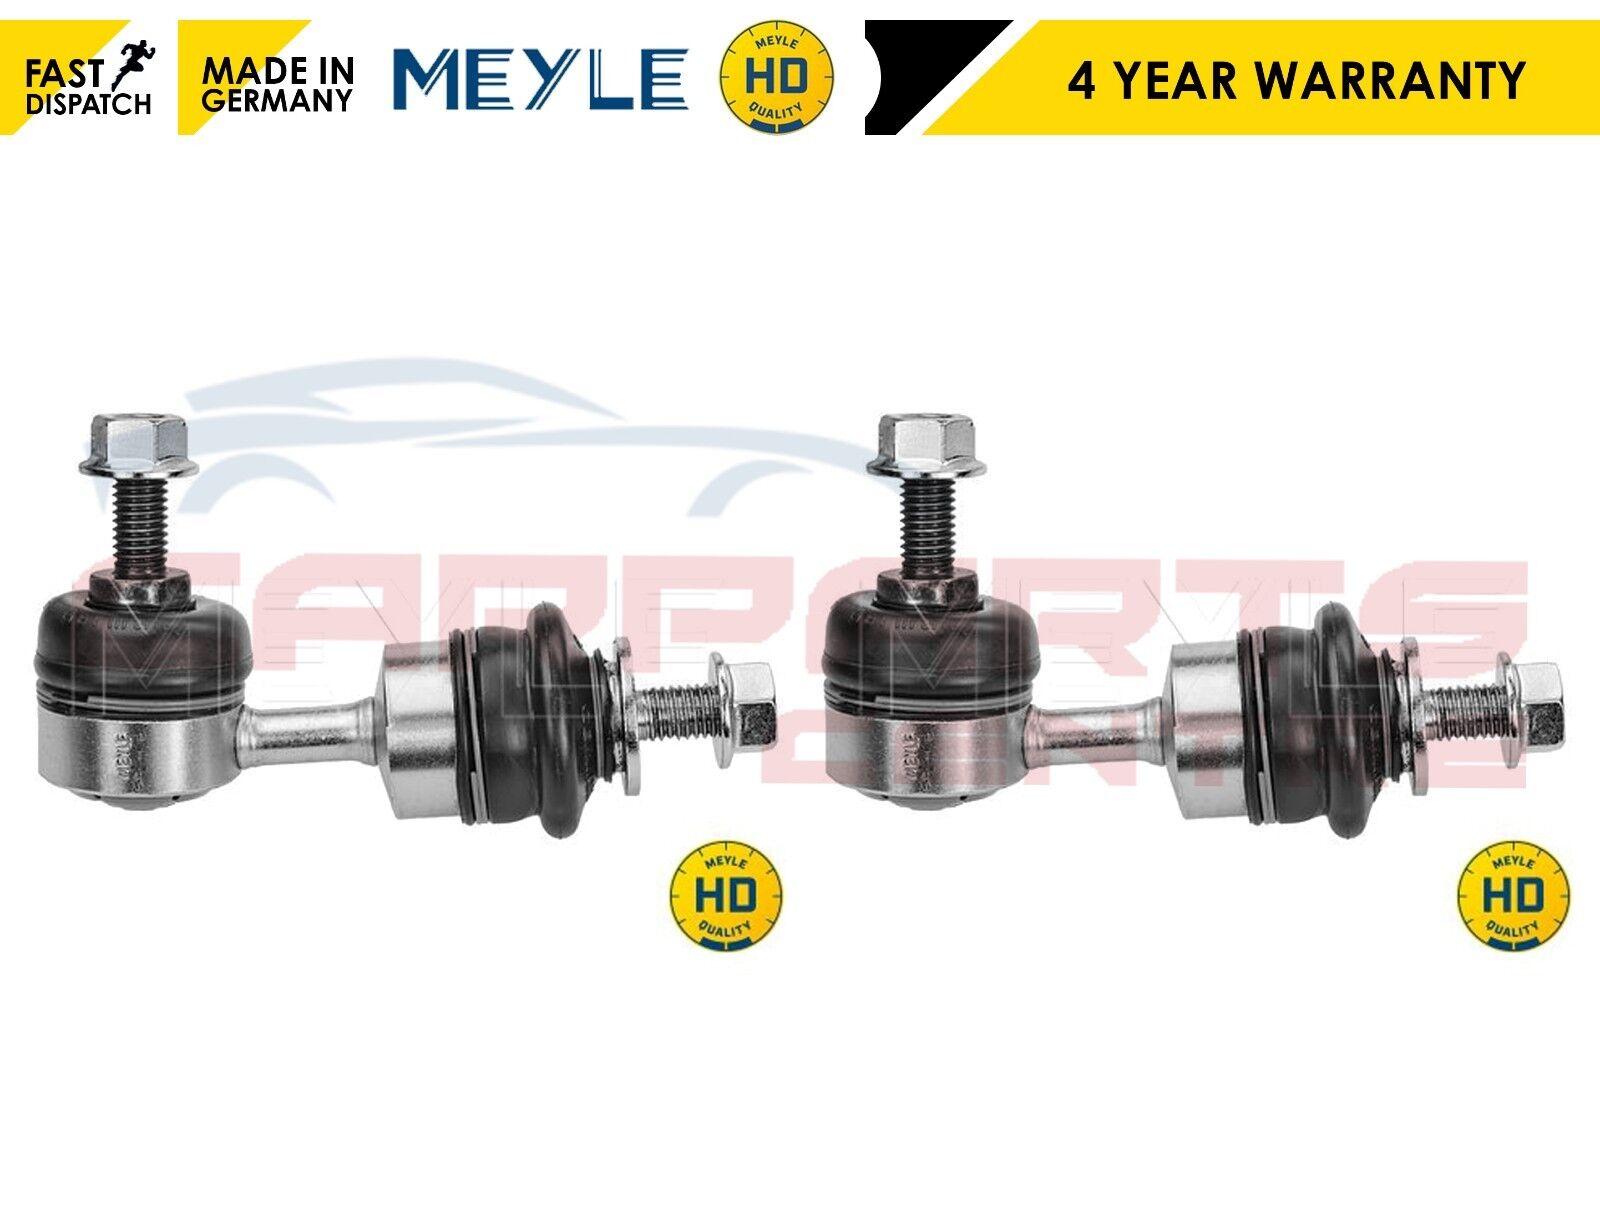 2x Rear Anti Roll Bar Stabiliser Drop Link for Ford Mondeo mk3 2000-2007 pair